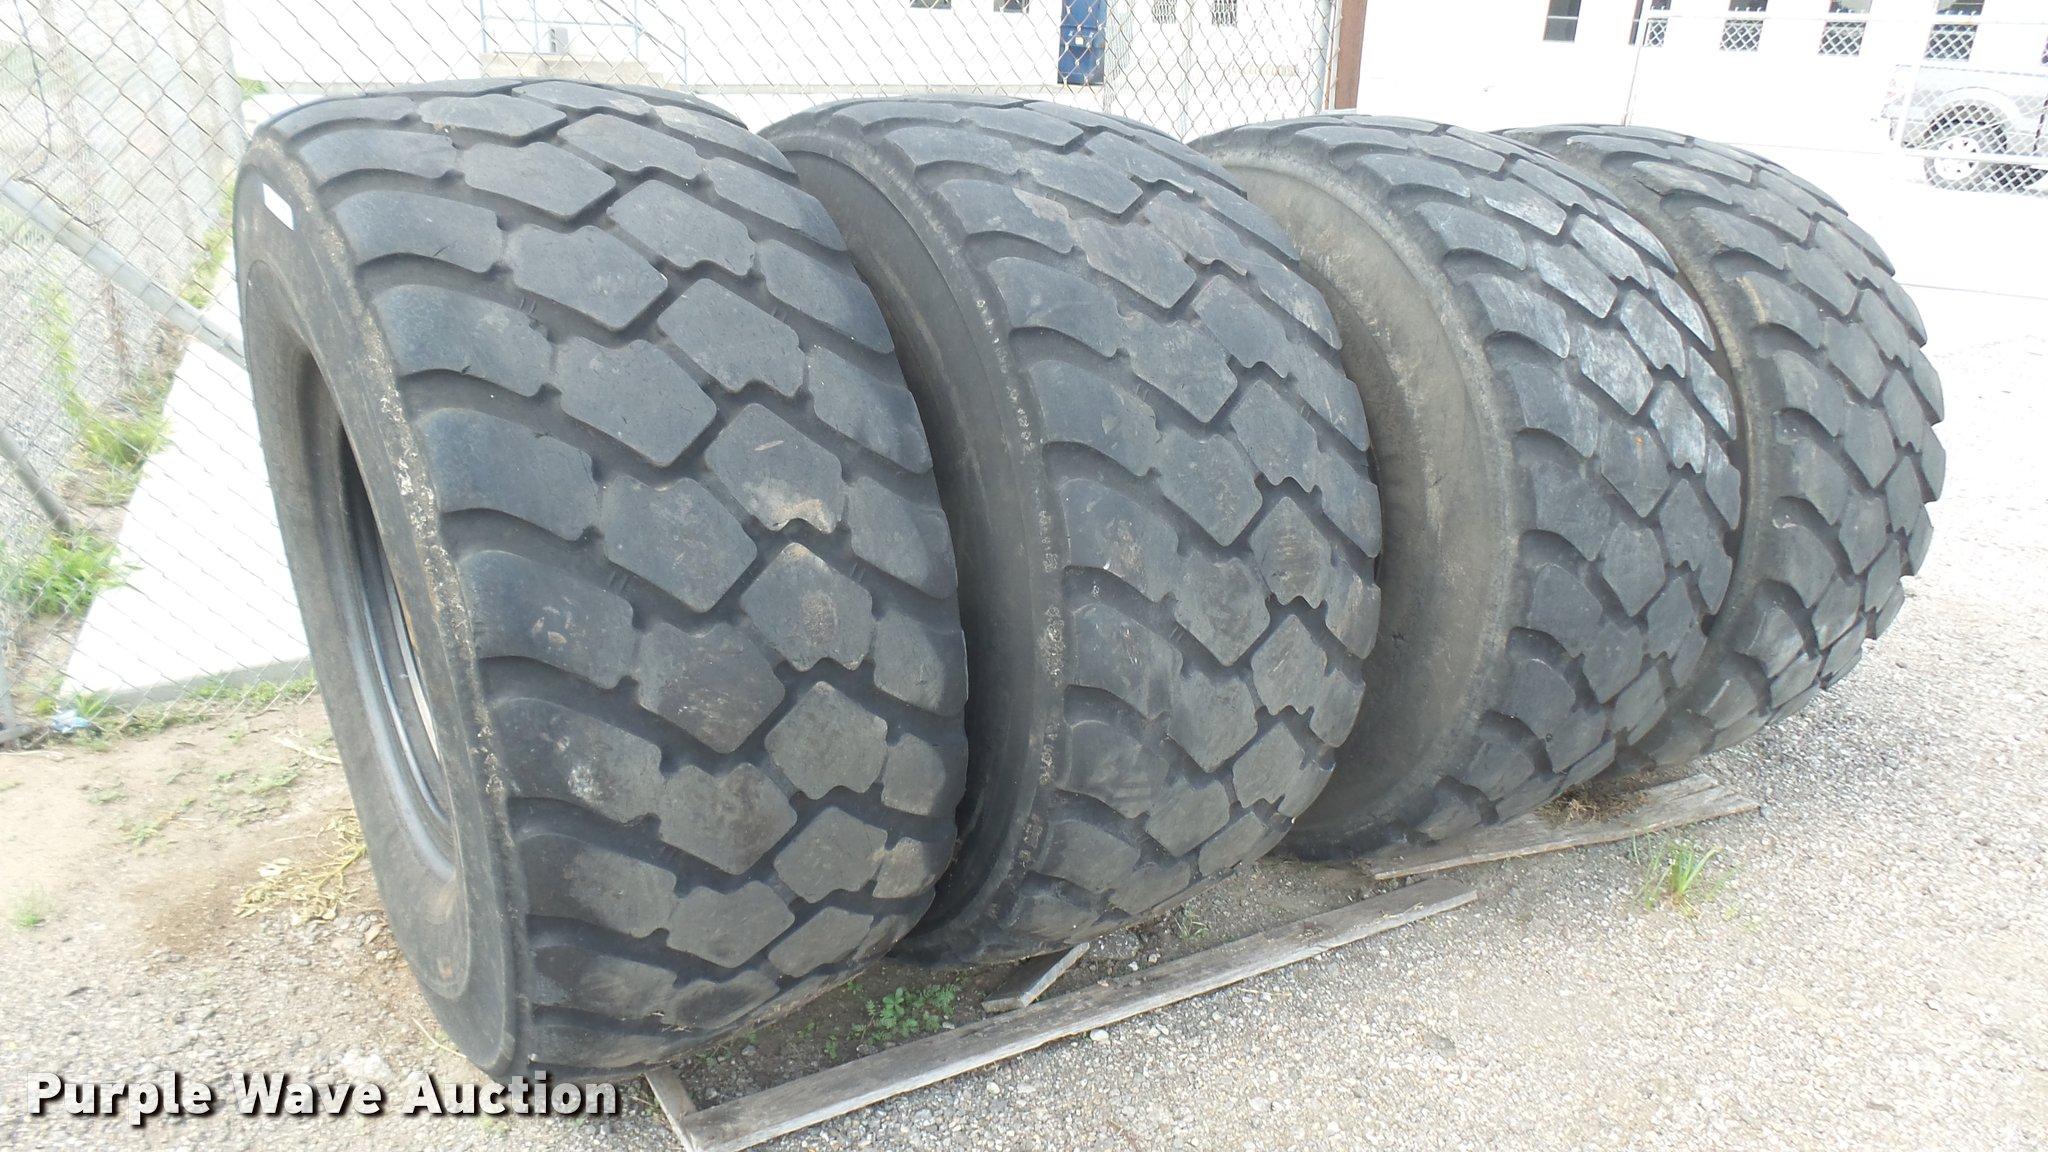 4 Michelin Xld L3 650 65r25 Tires Item Dl9923 Sold Se